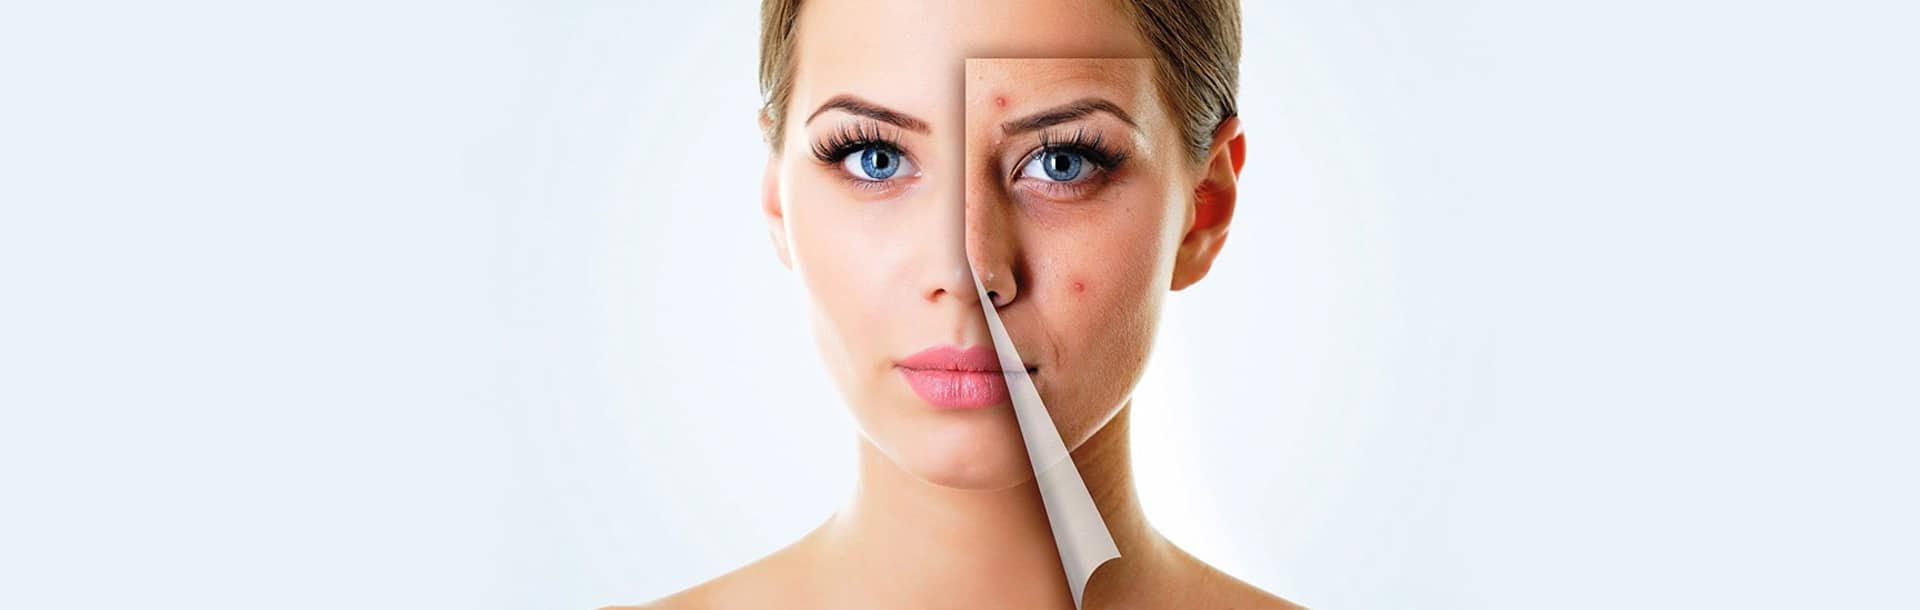 فلوشیپ آسیب شناسی پوست (درماتوپاتولوژی)